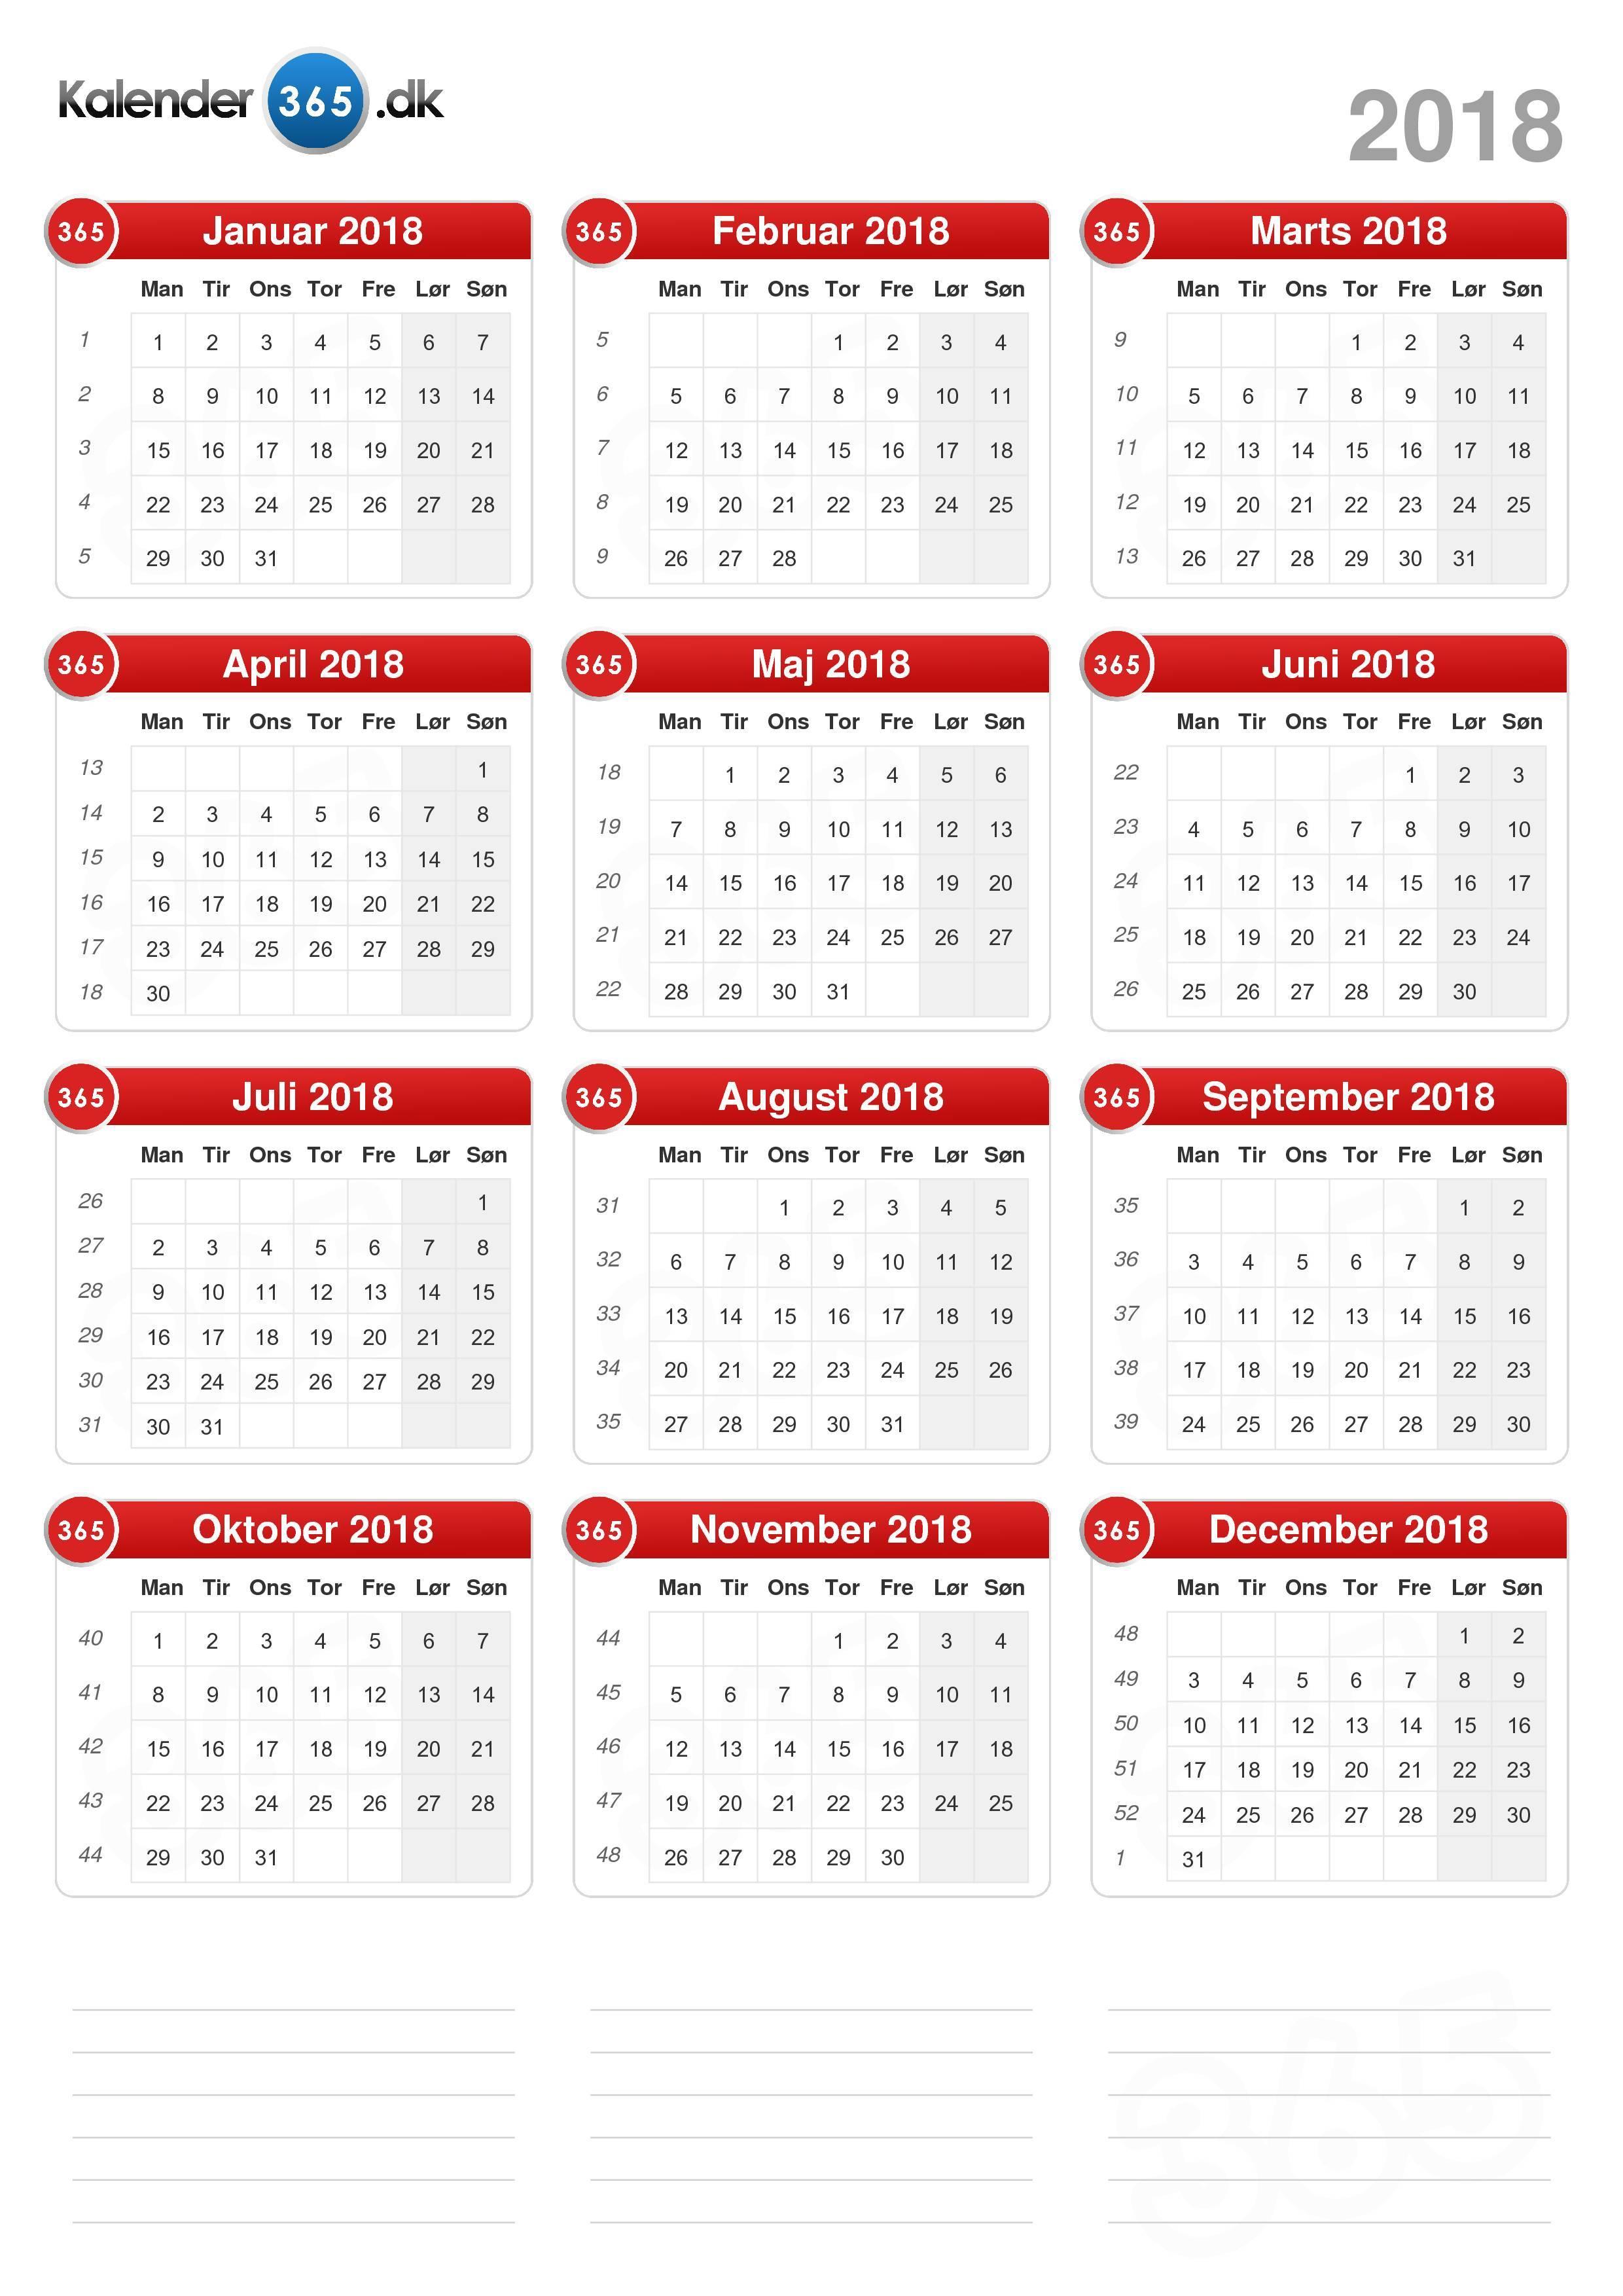 kalender med dagens nummer